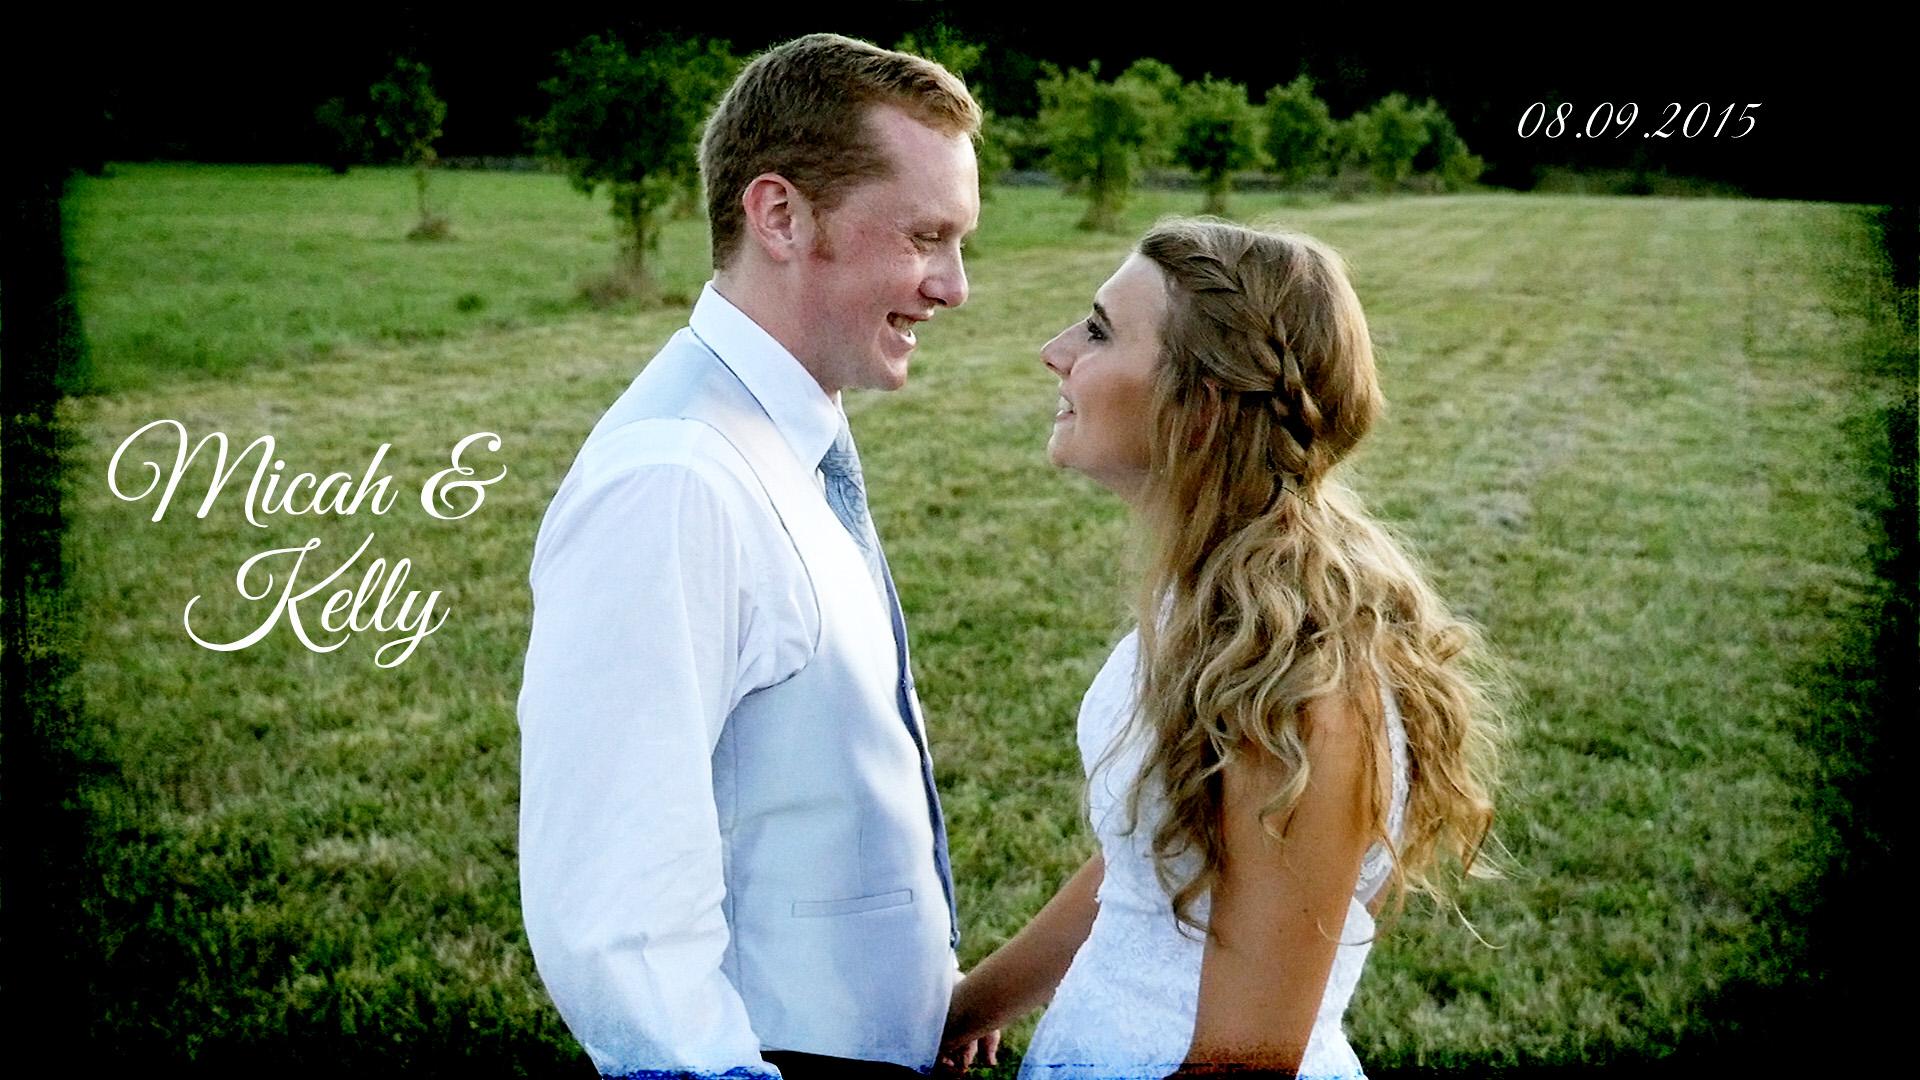 Micah & Kelly – Ithaca NY Wedding Video